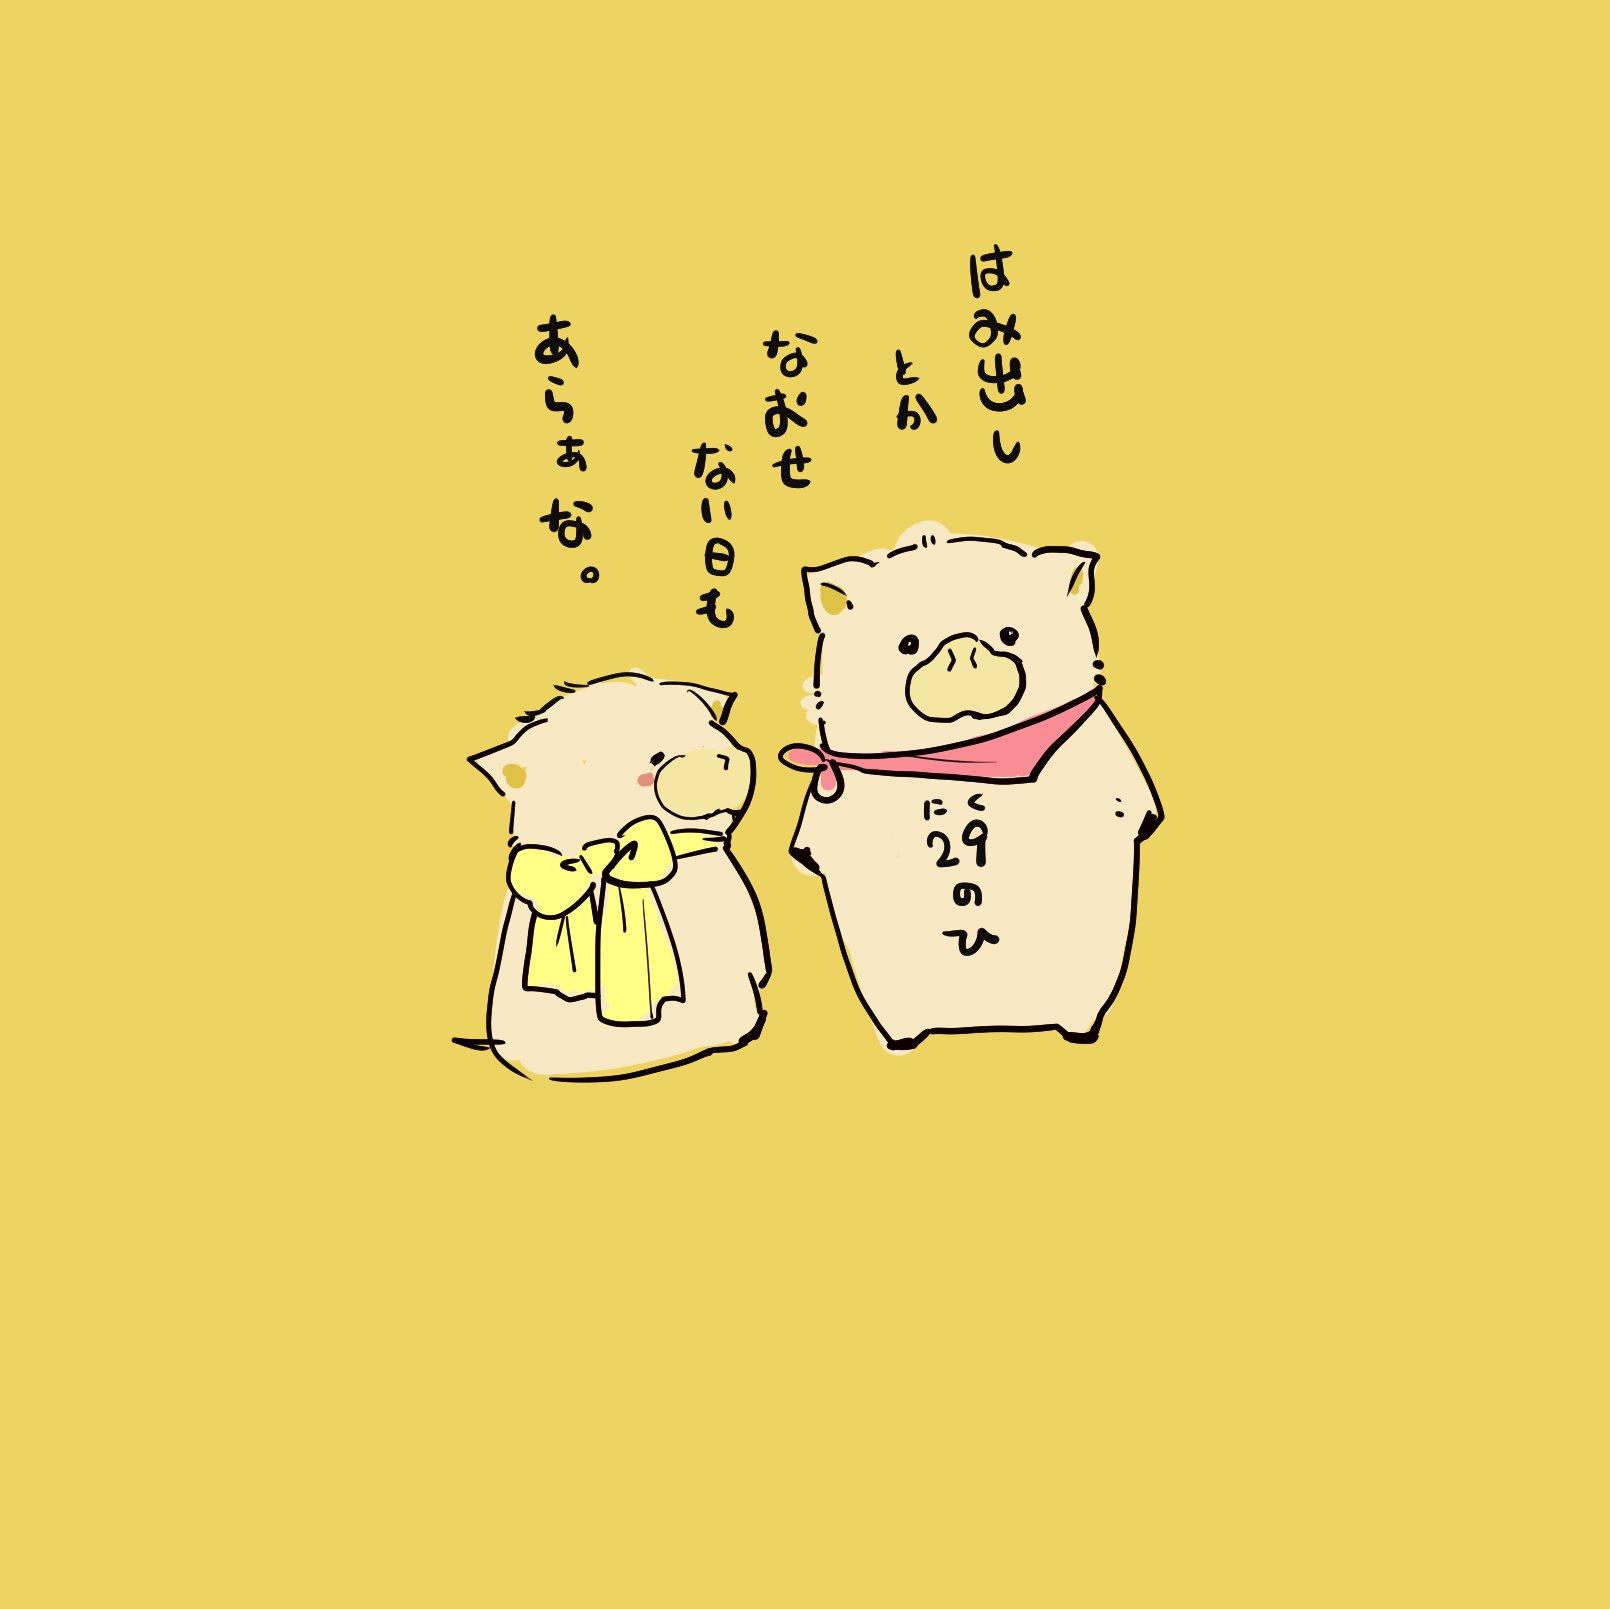 "<span class=""title"">#ニクの日</span>"